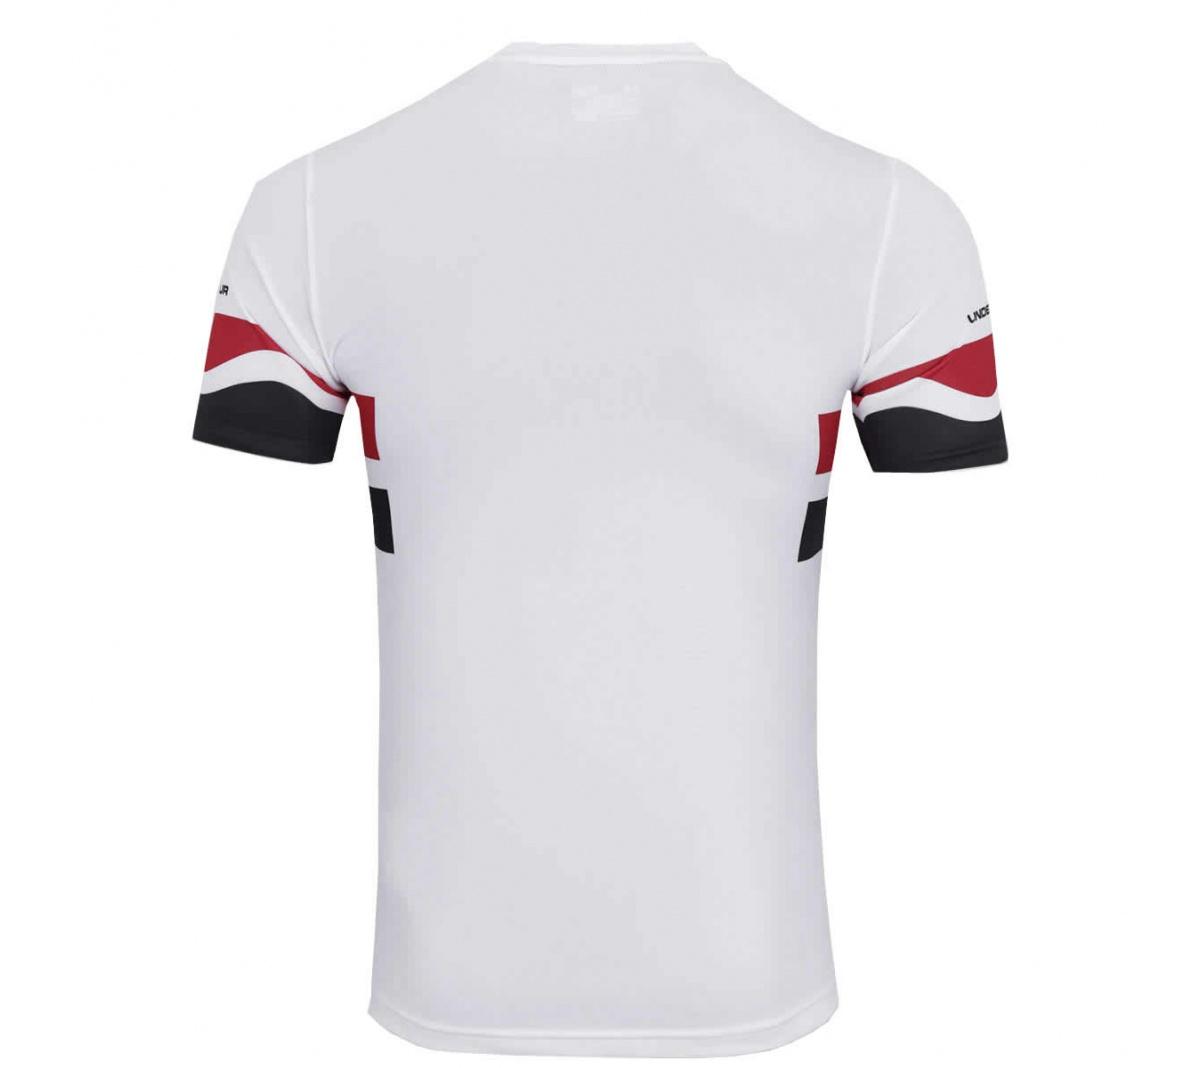 Camisa São Paulo I Under Armour 2016